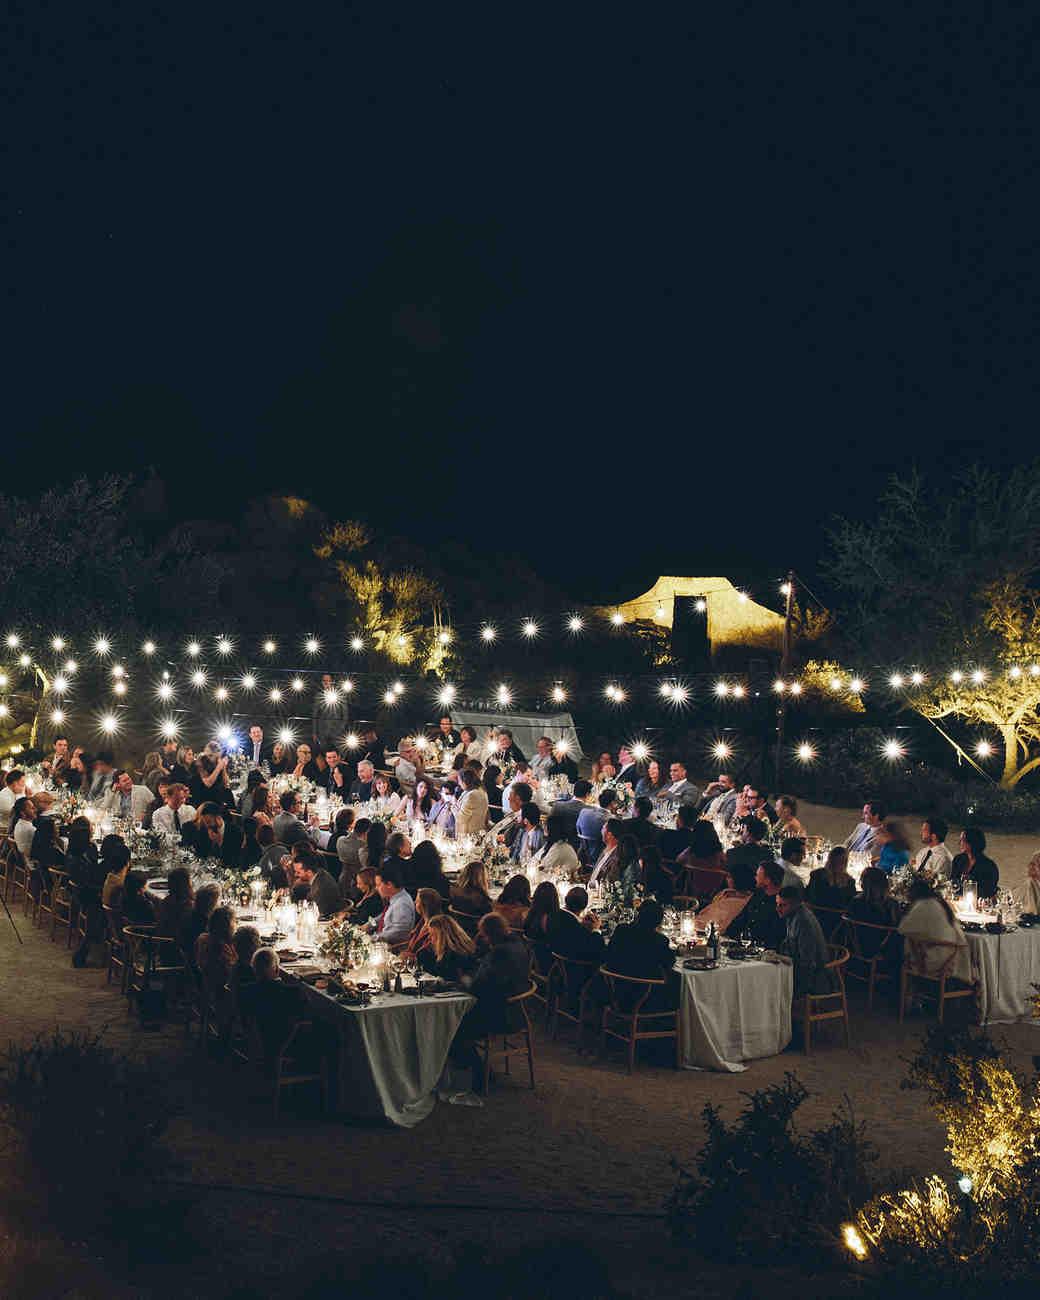 ashley basil wedding dinner string lights at night